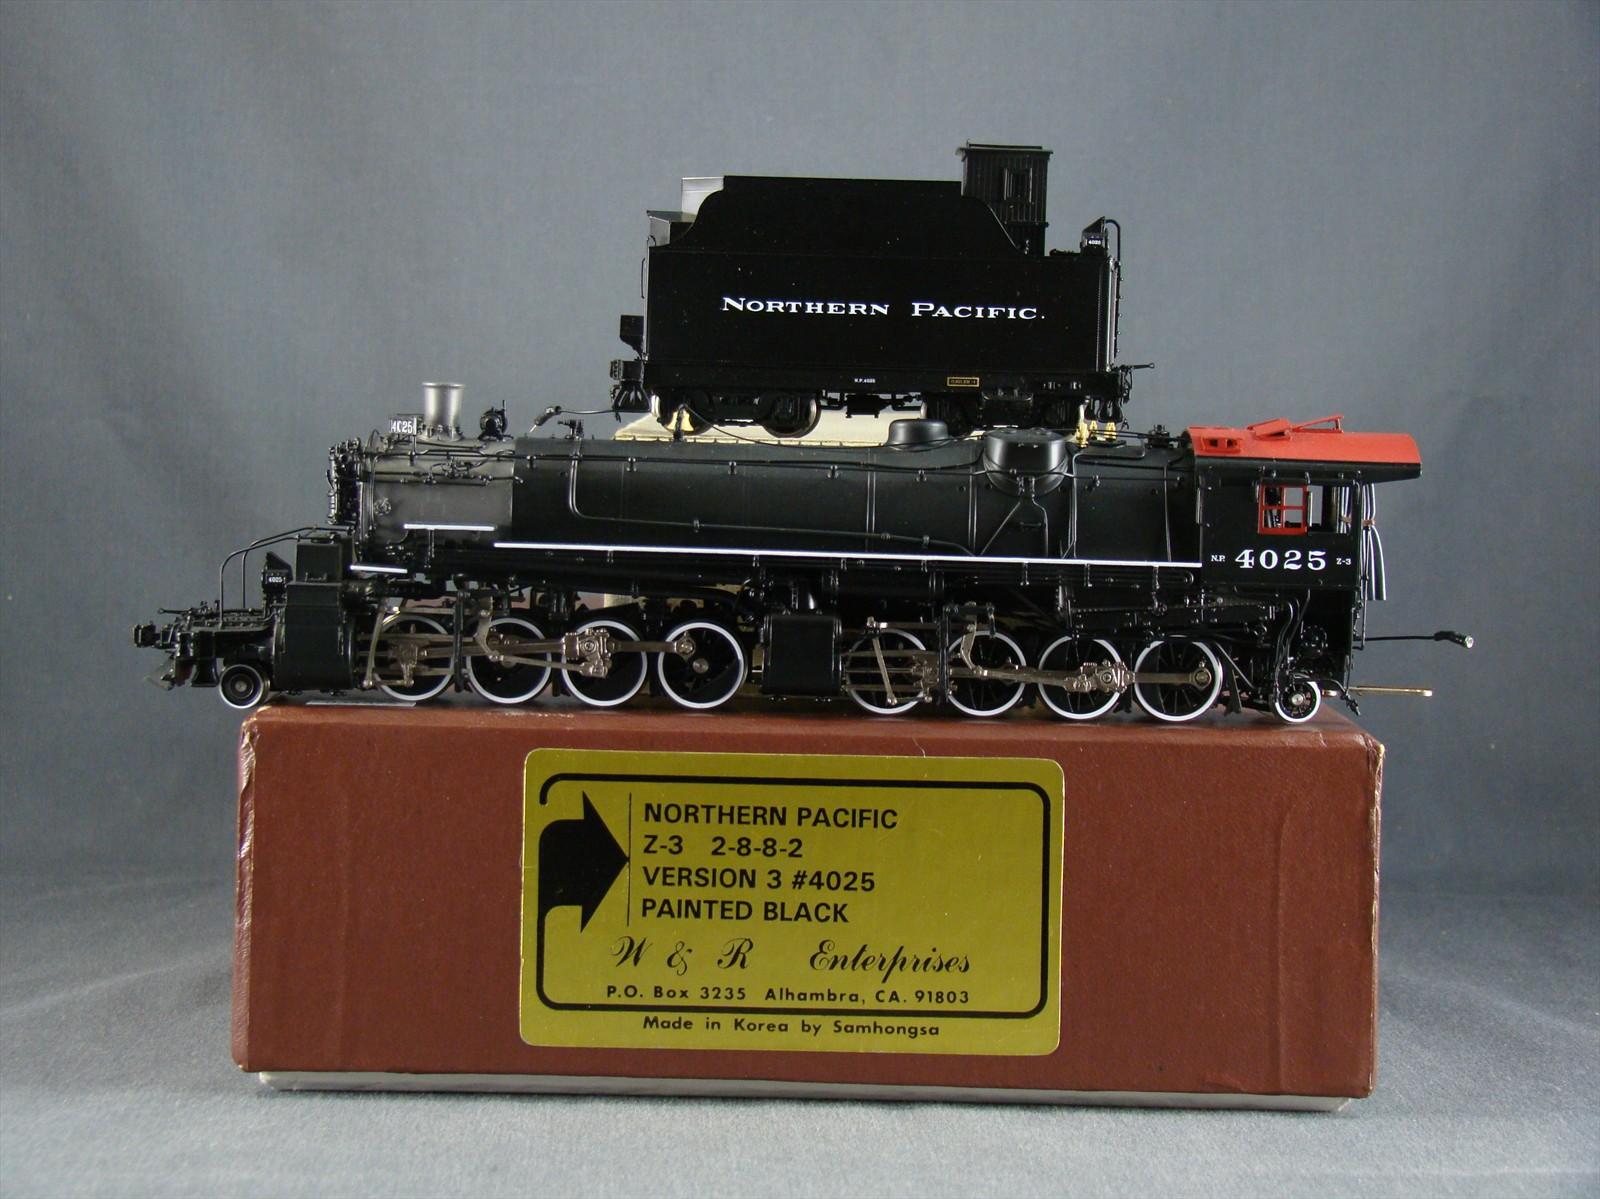 W&R NP Z-3 - Northern Pacific, 2-8-8-2, Version 3, No.4025, Black .10 Box